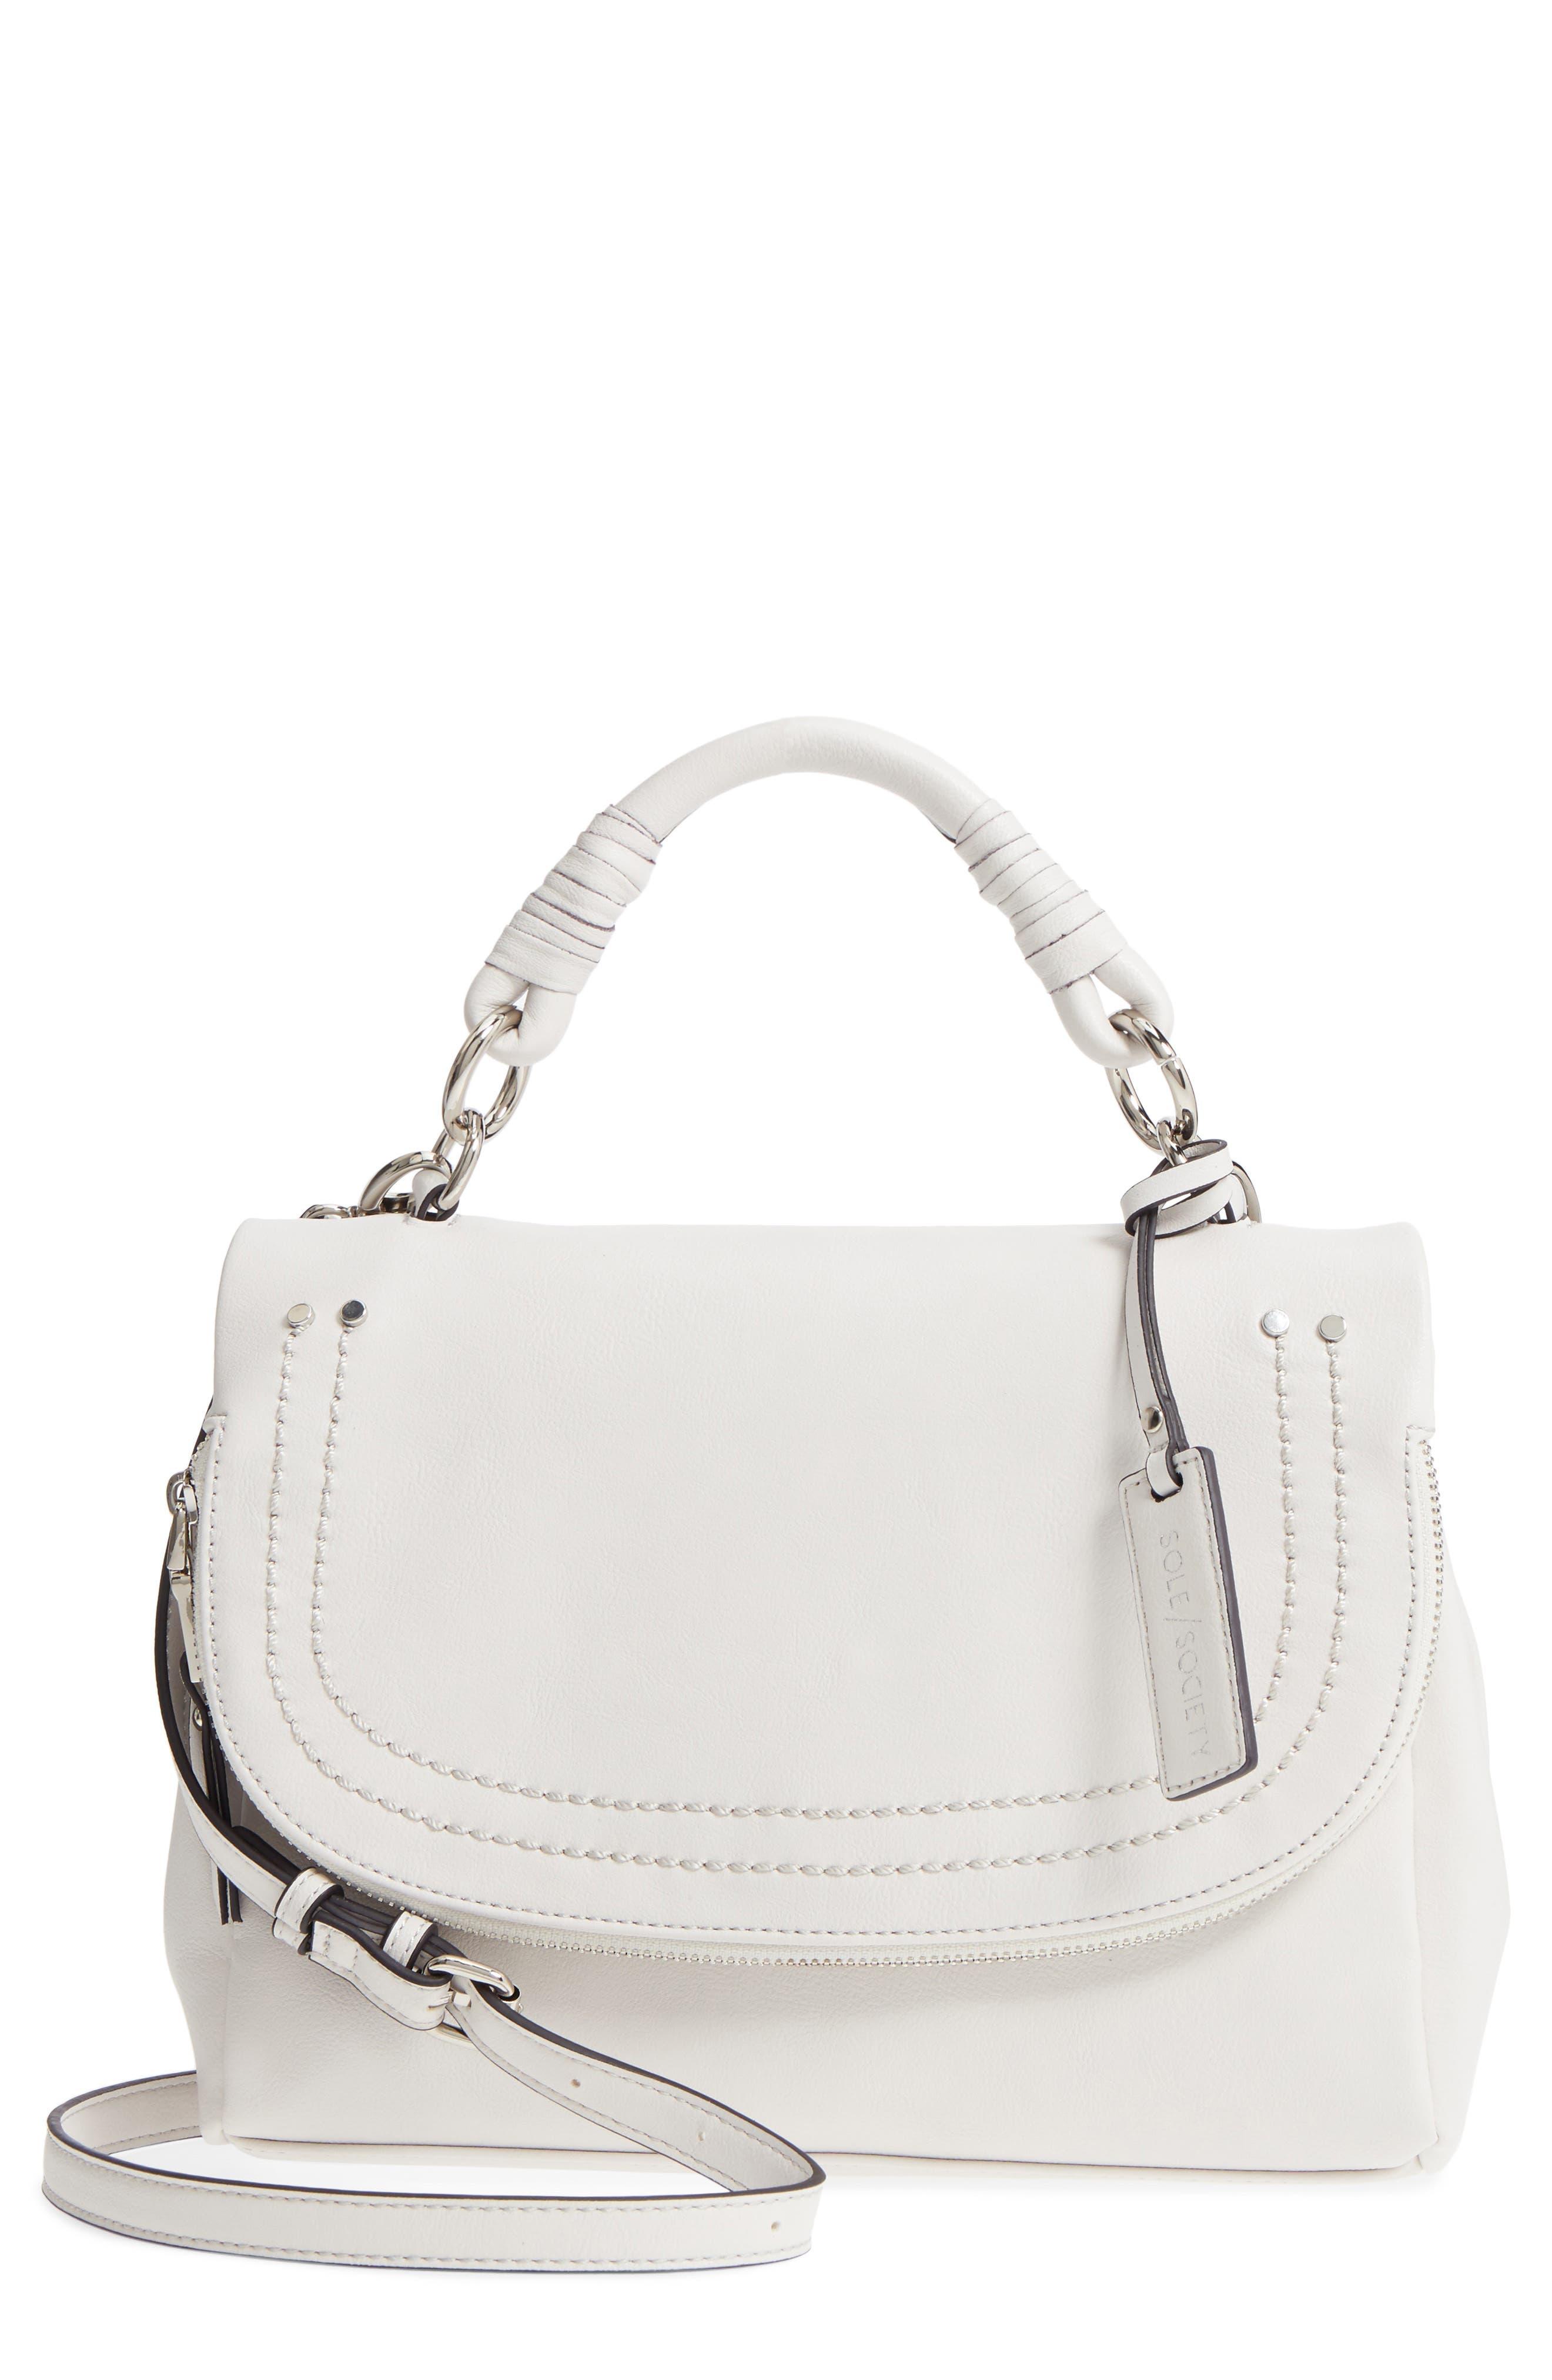 Top Handle Faux Leather Crossbody Bag,                             Main thumbnail 1, color,                             101